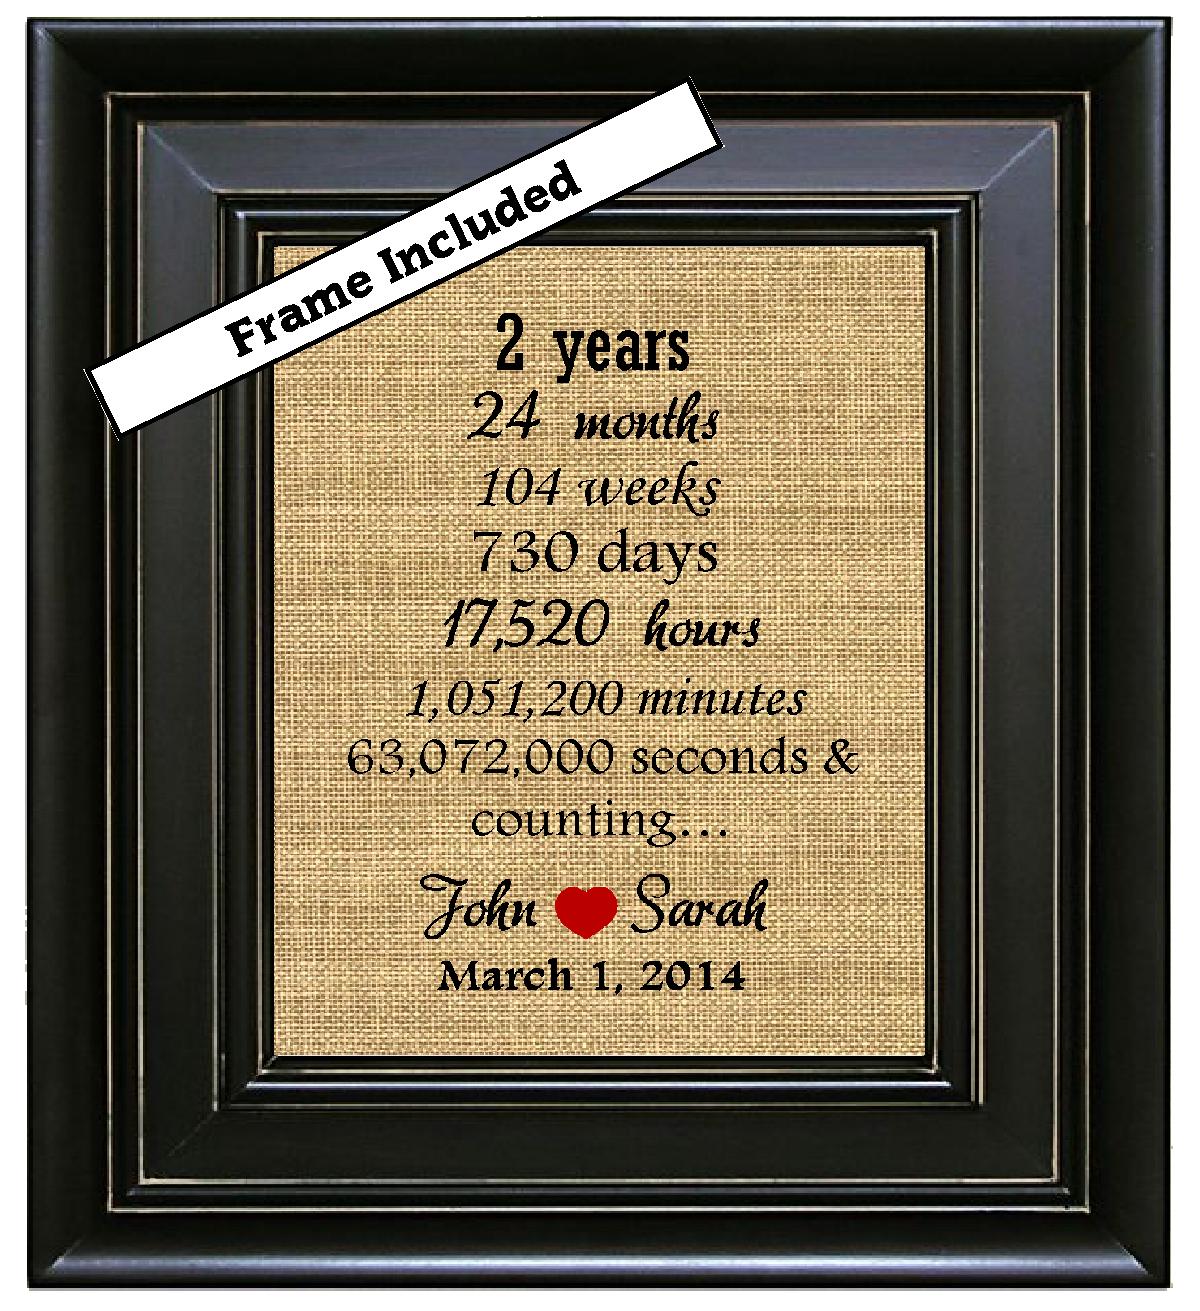 Pin by April on Burlap N Glass Third wedding anniversary